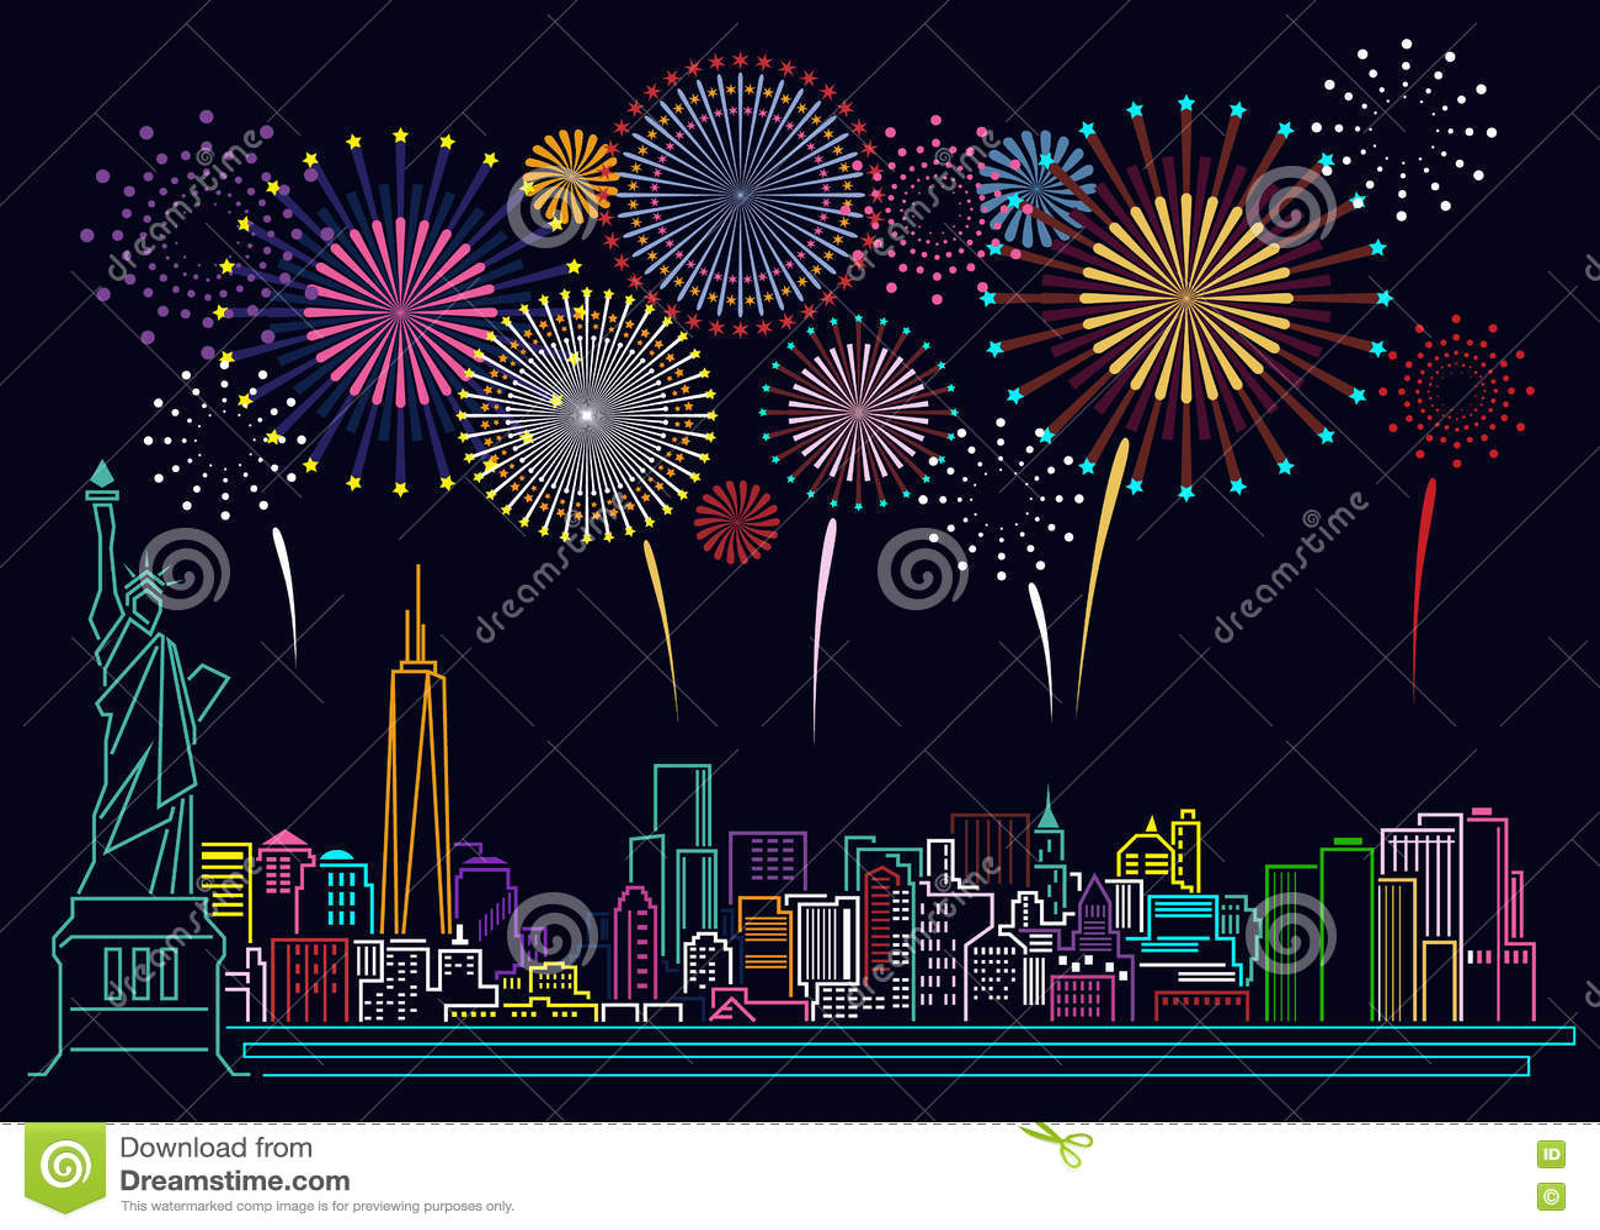 New Year S Line Art : New york city skyline black and white illustration vector